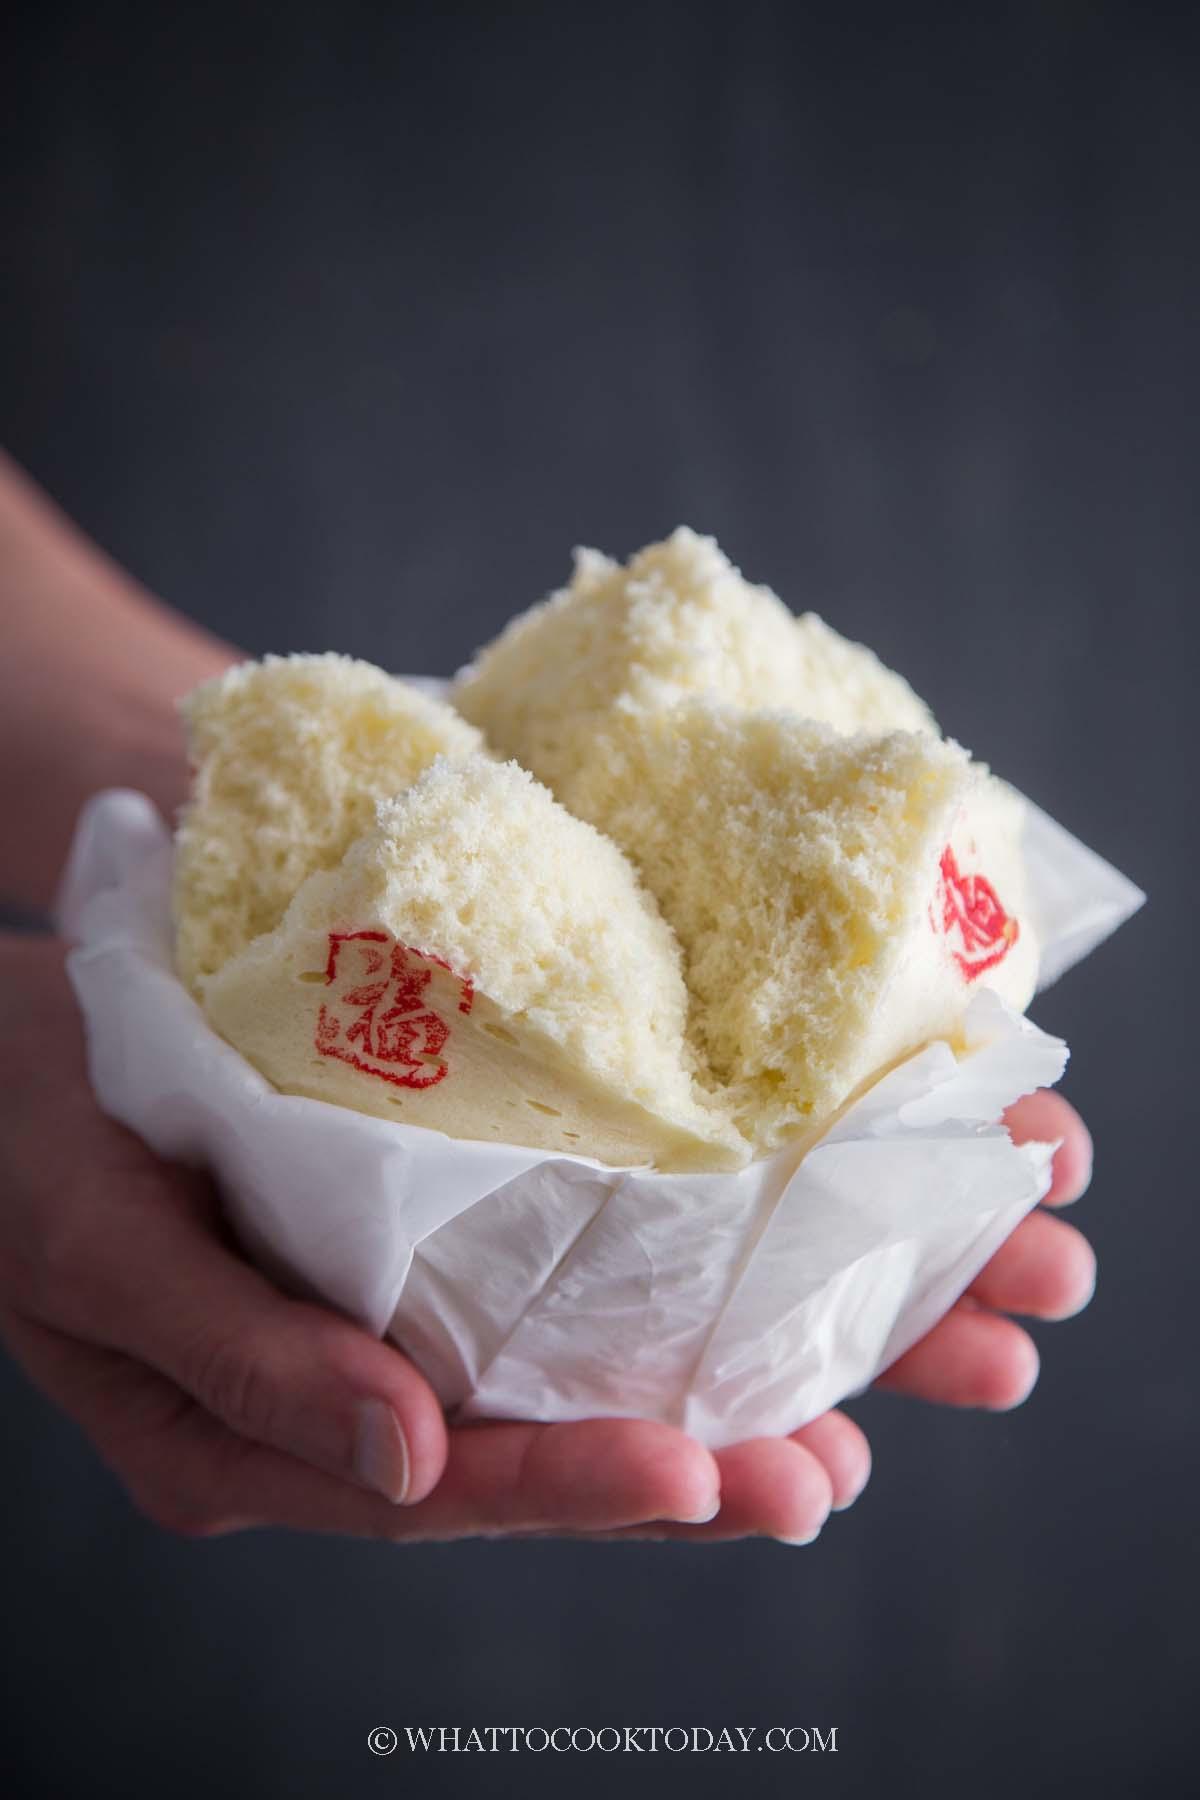 Traditional Ji Dan Gao / Kueh Neng Ko (Chinese Steamed Egg Sponge Cake)